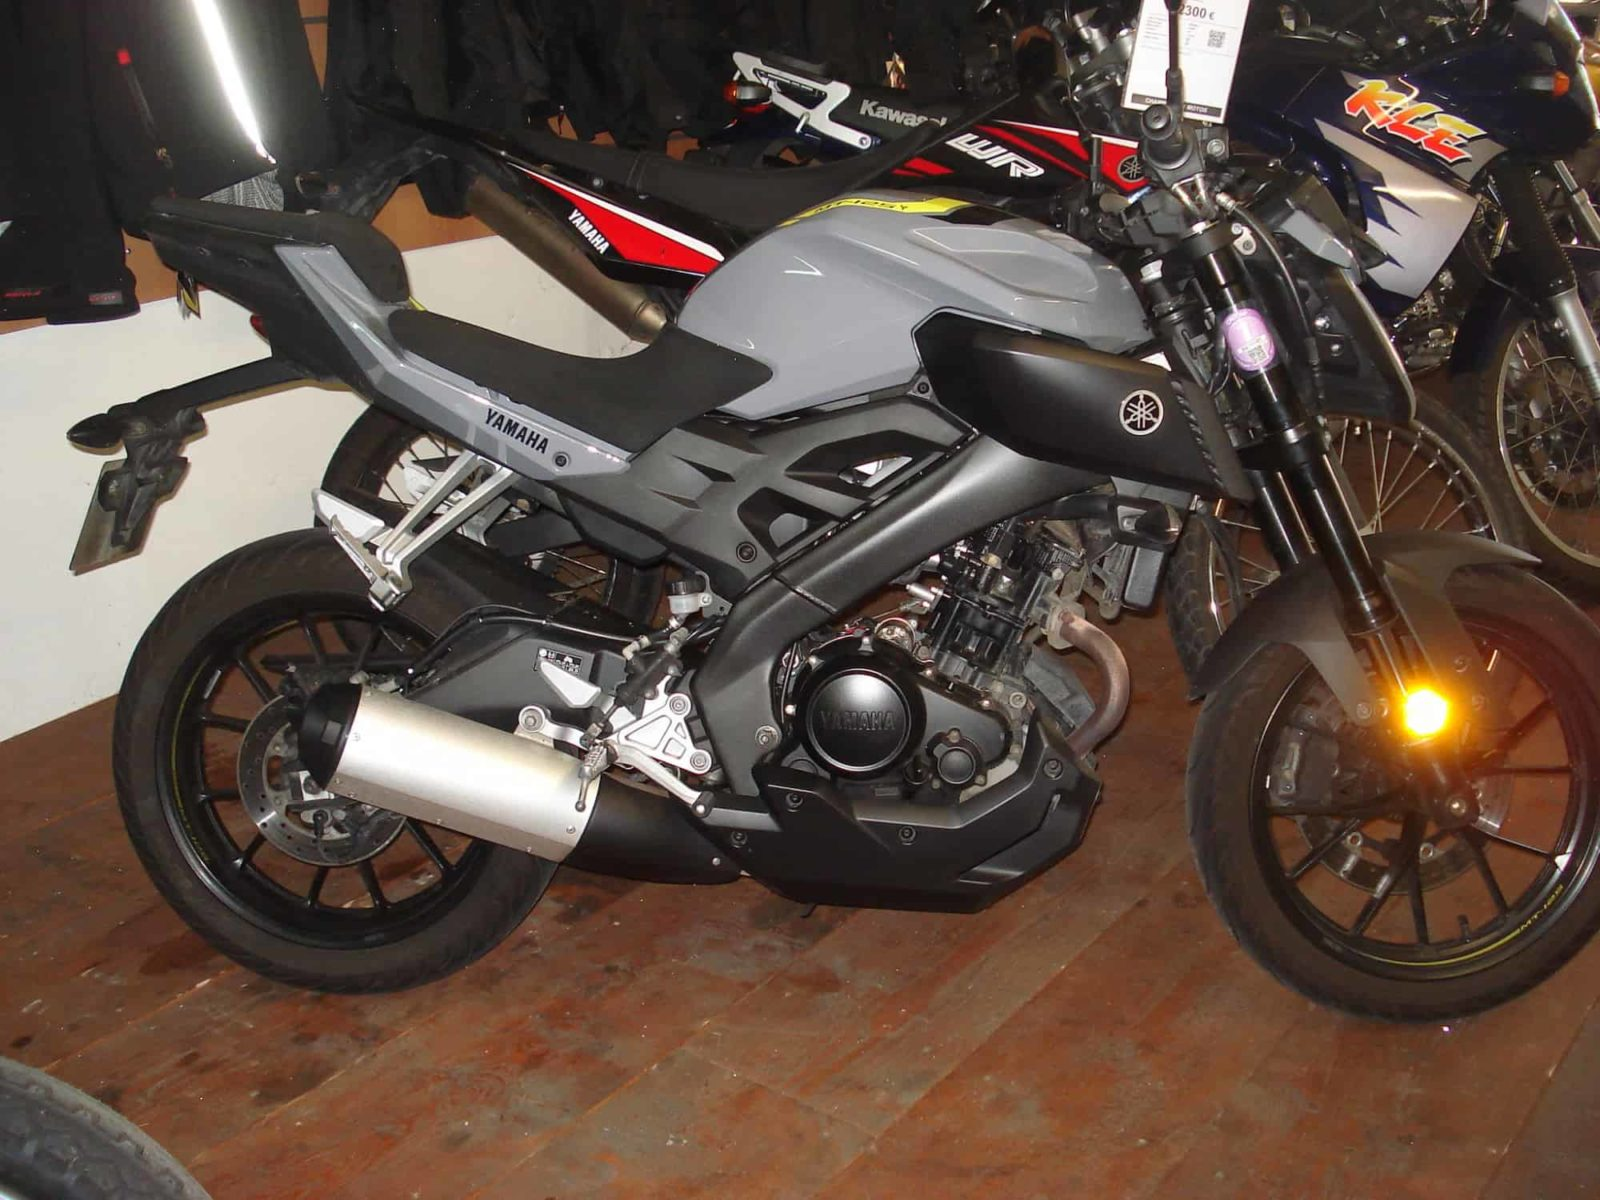 Vendu ! Yamaha MT-125 – 3700€